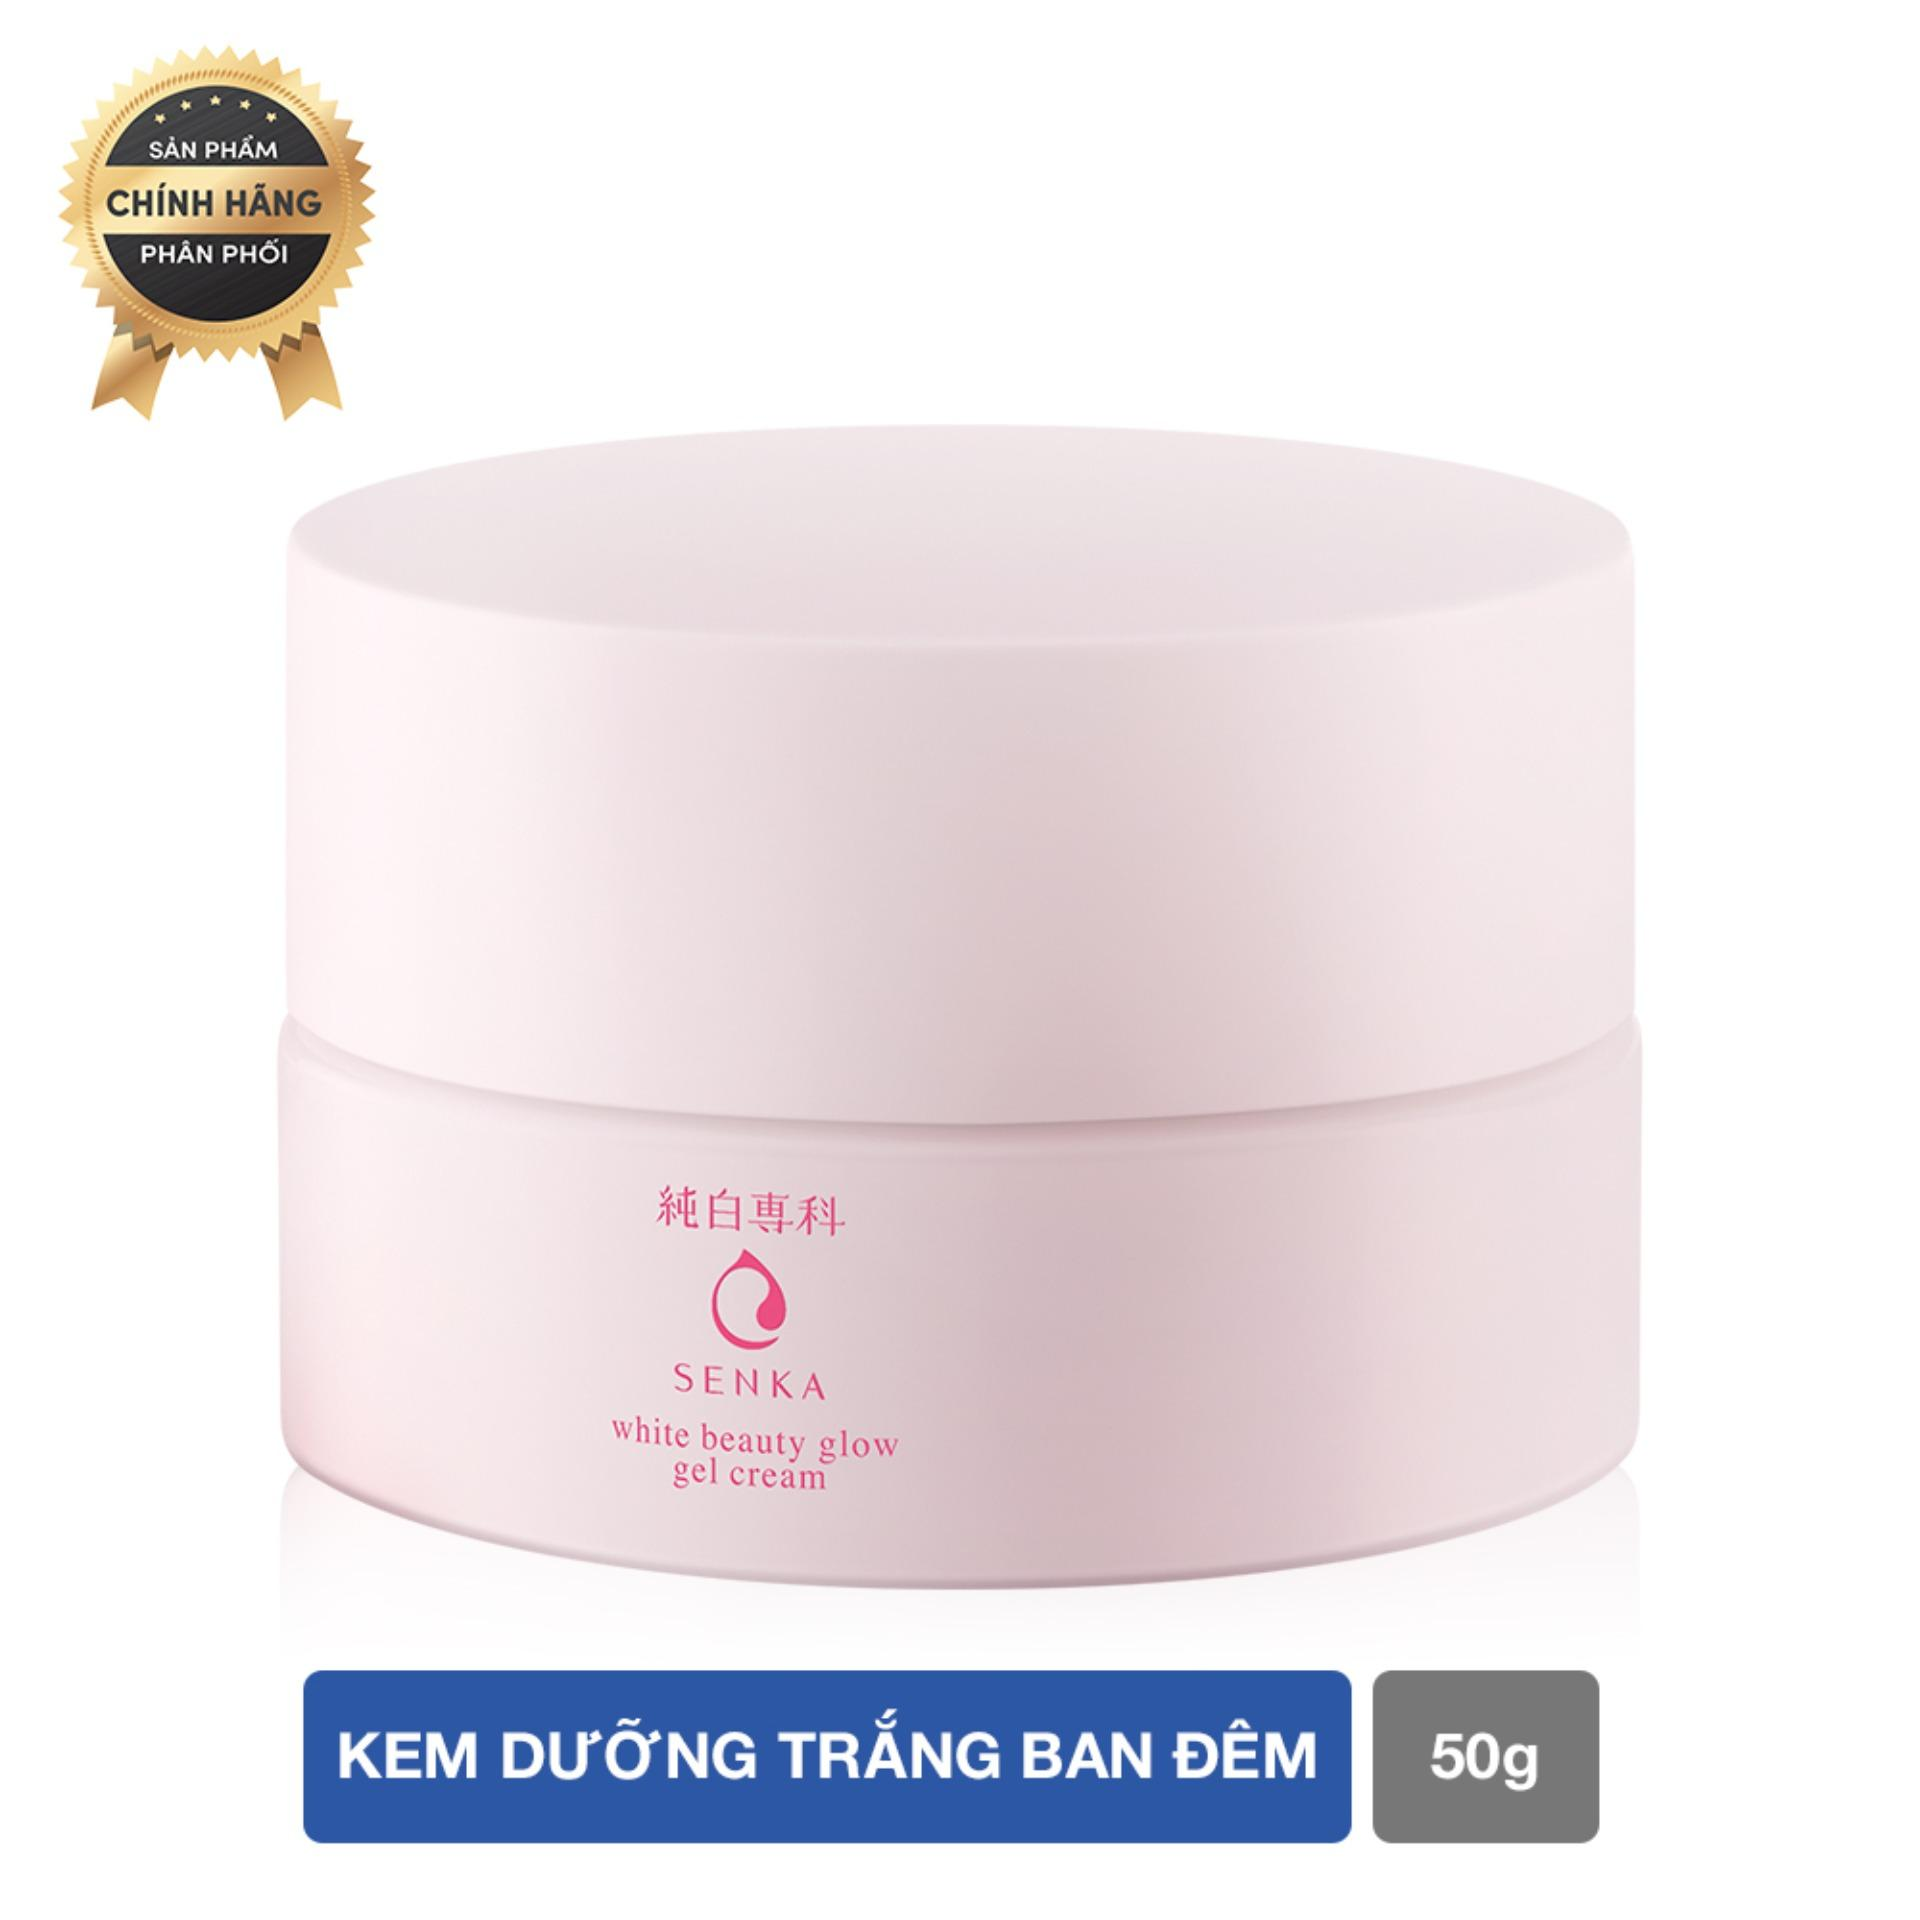 Kem dưỡng trắng ban đêm Senka White Beauty Glow Gel Cream 50g